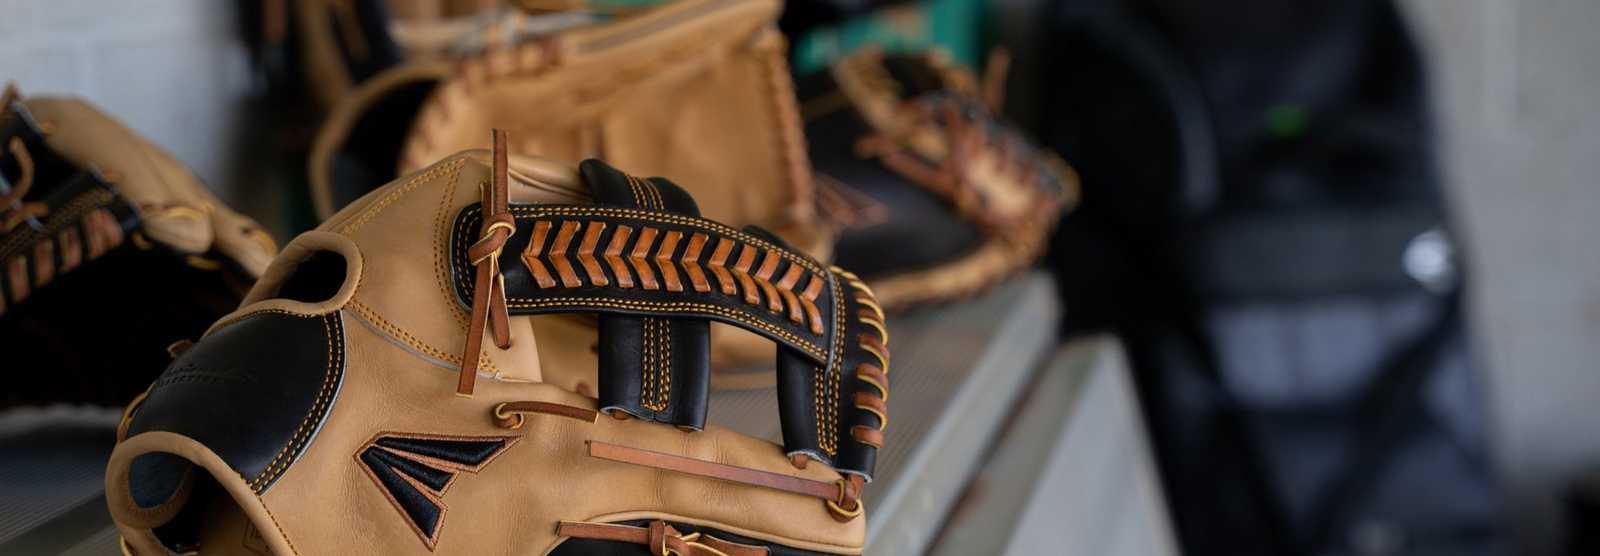 baseball-professional-collection-kip-ball-gloves